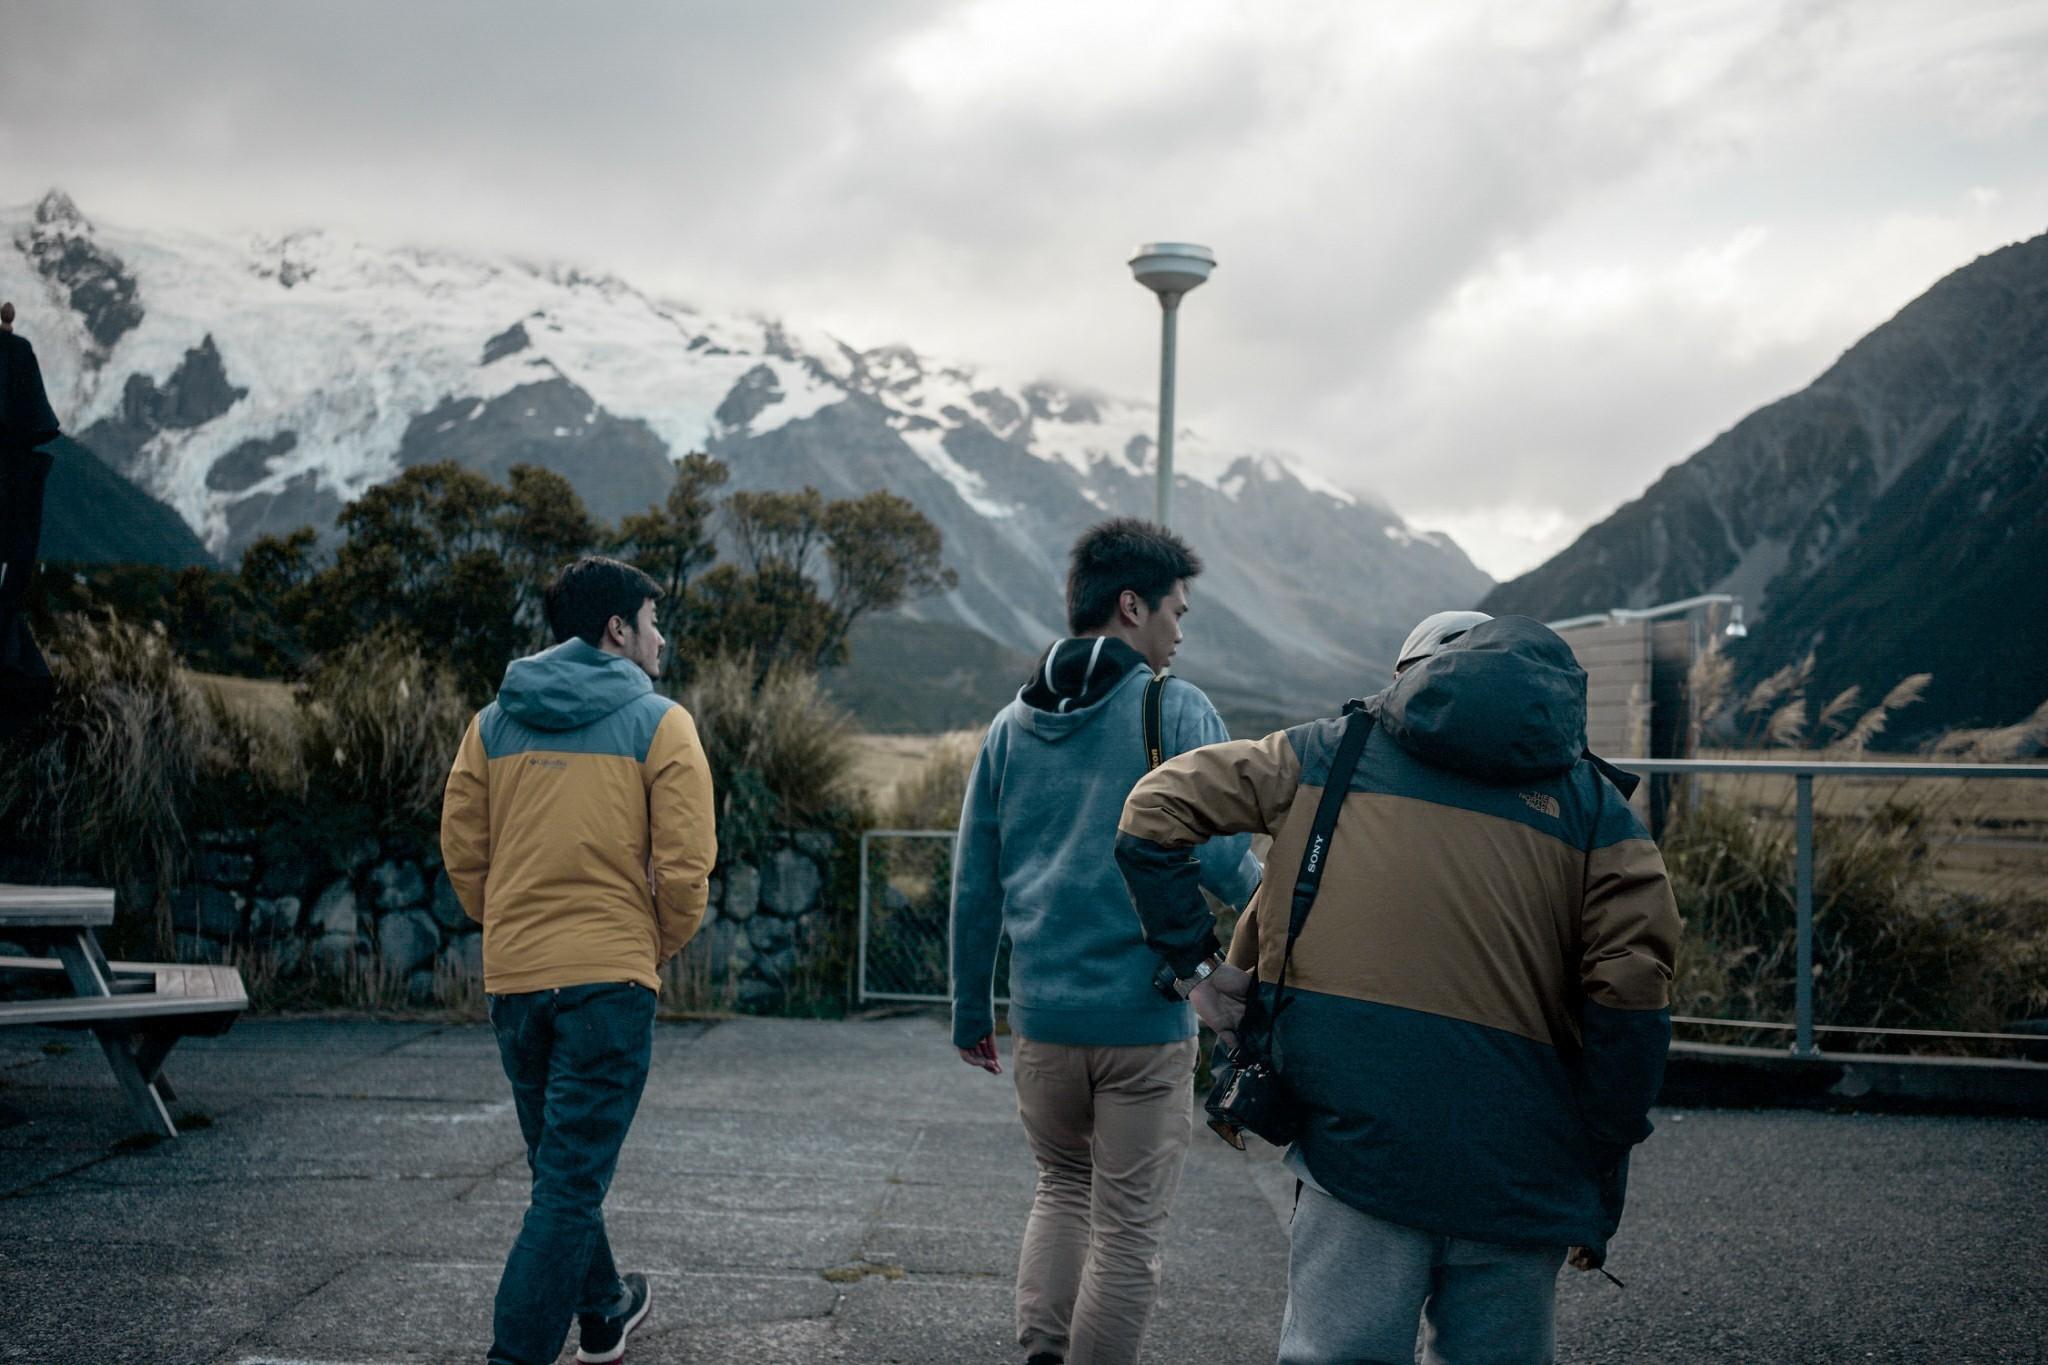 New Zealand Edited_180329_0001.jpg